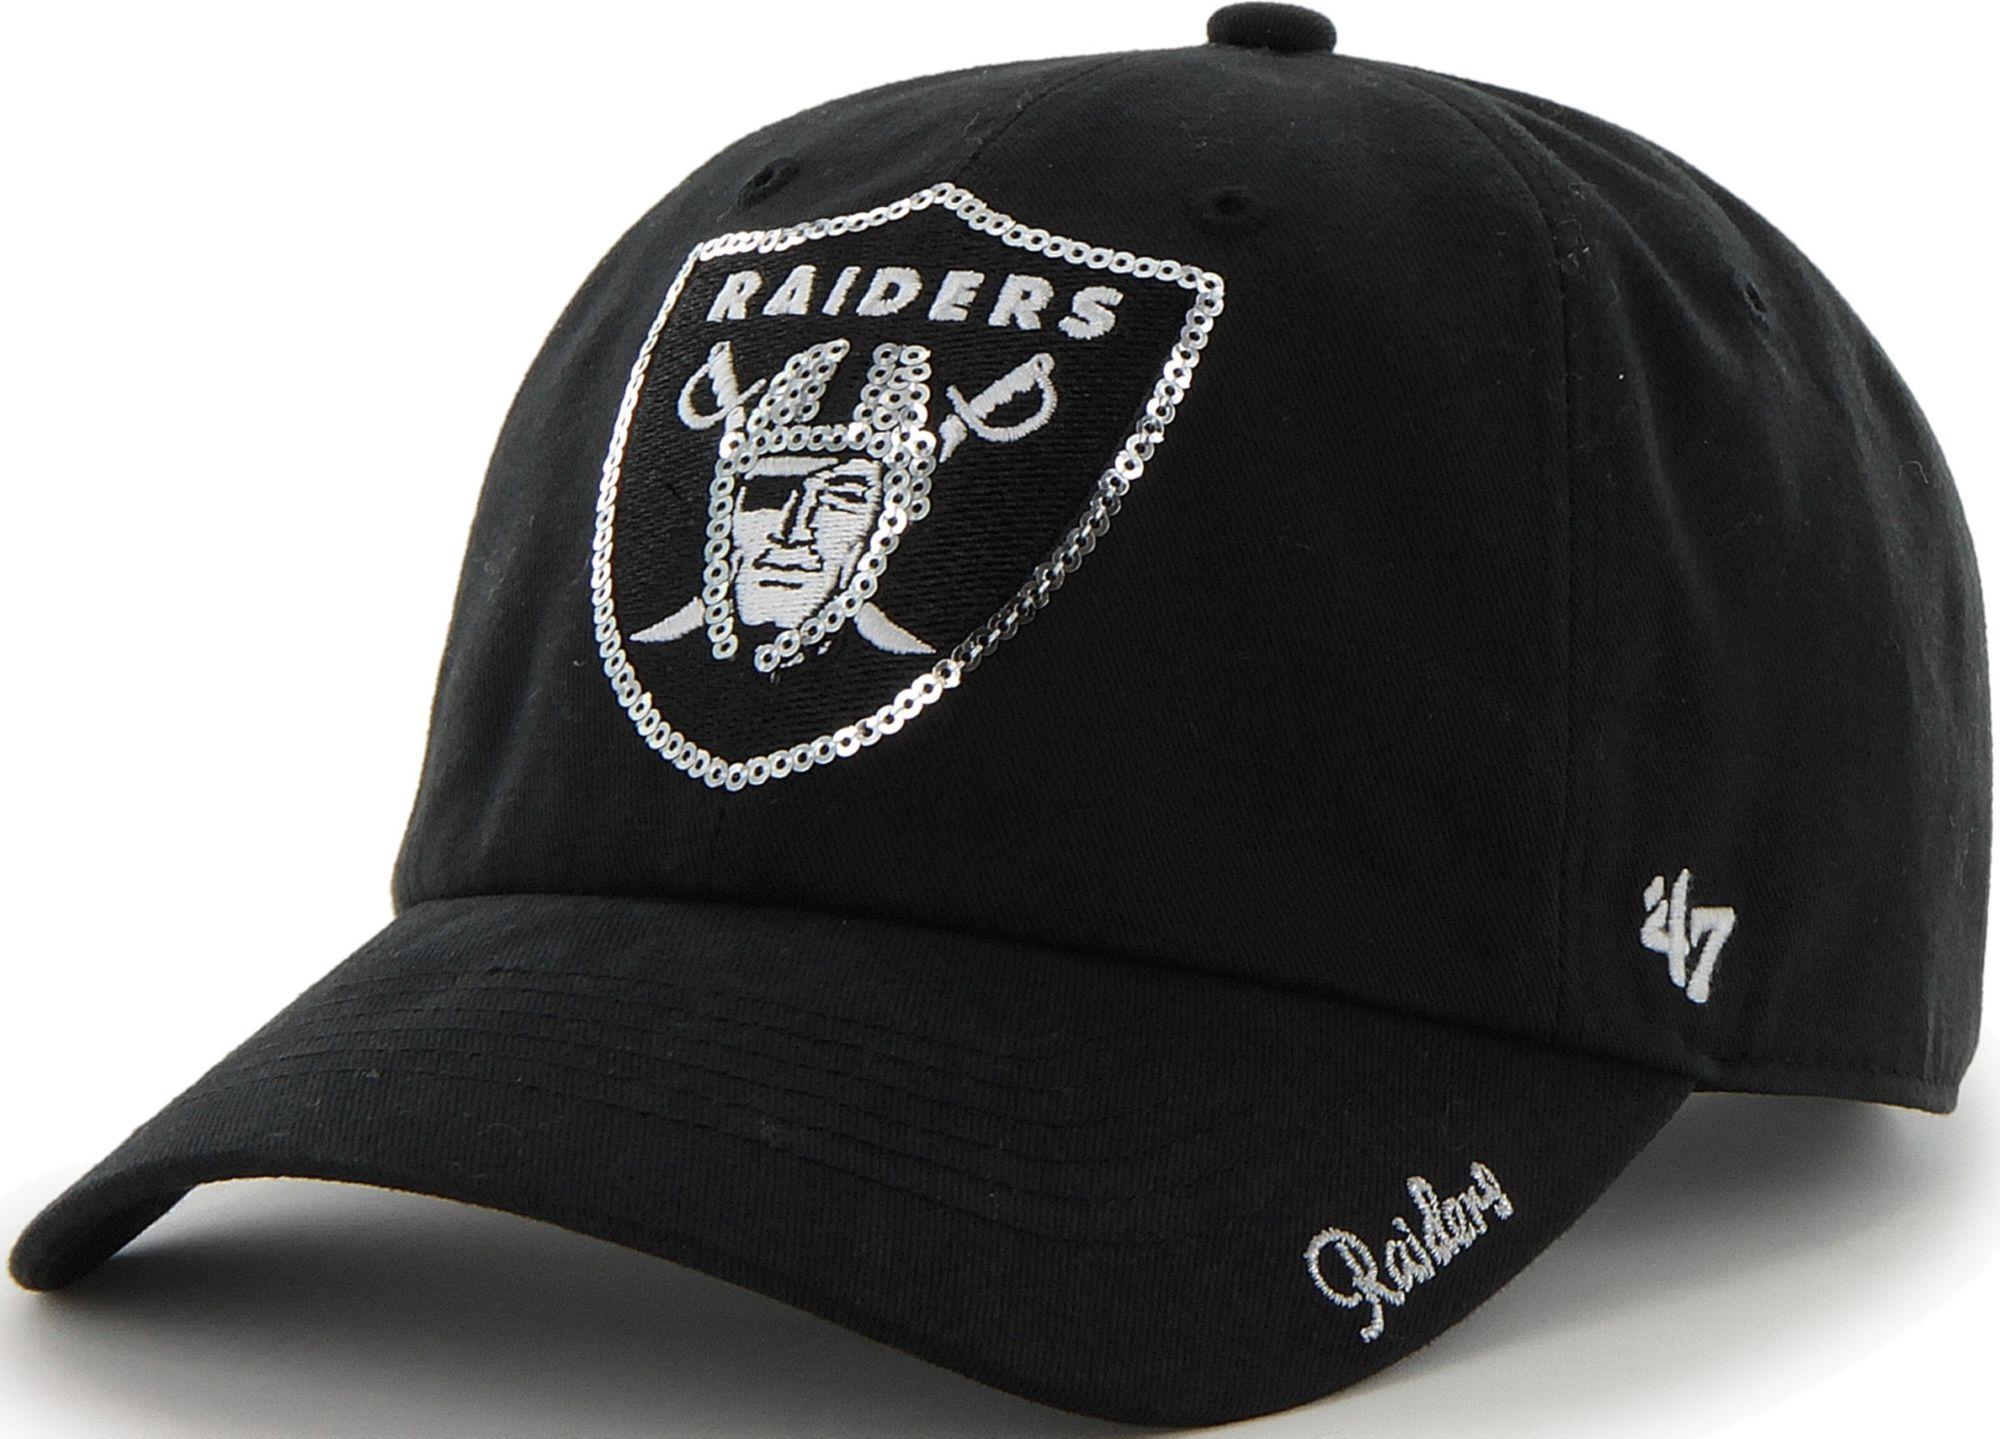 best cheap b0d41 dae12 ... order 47 womens oakland raiders sparkle logo black adjustable hat bd767  3d307